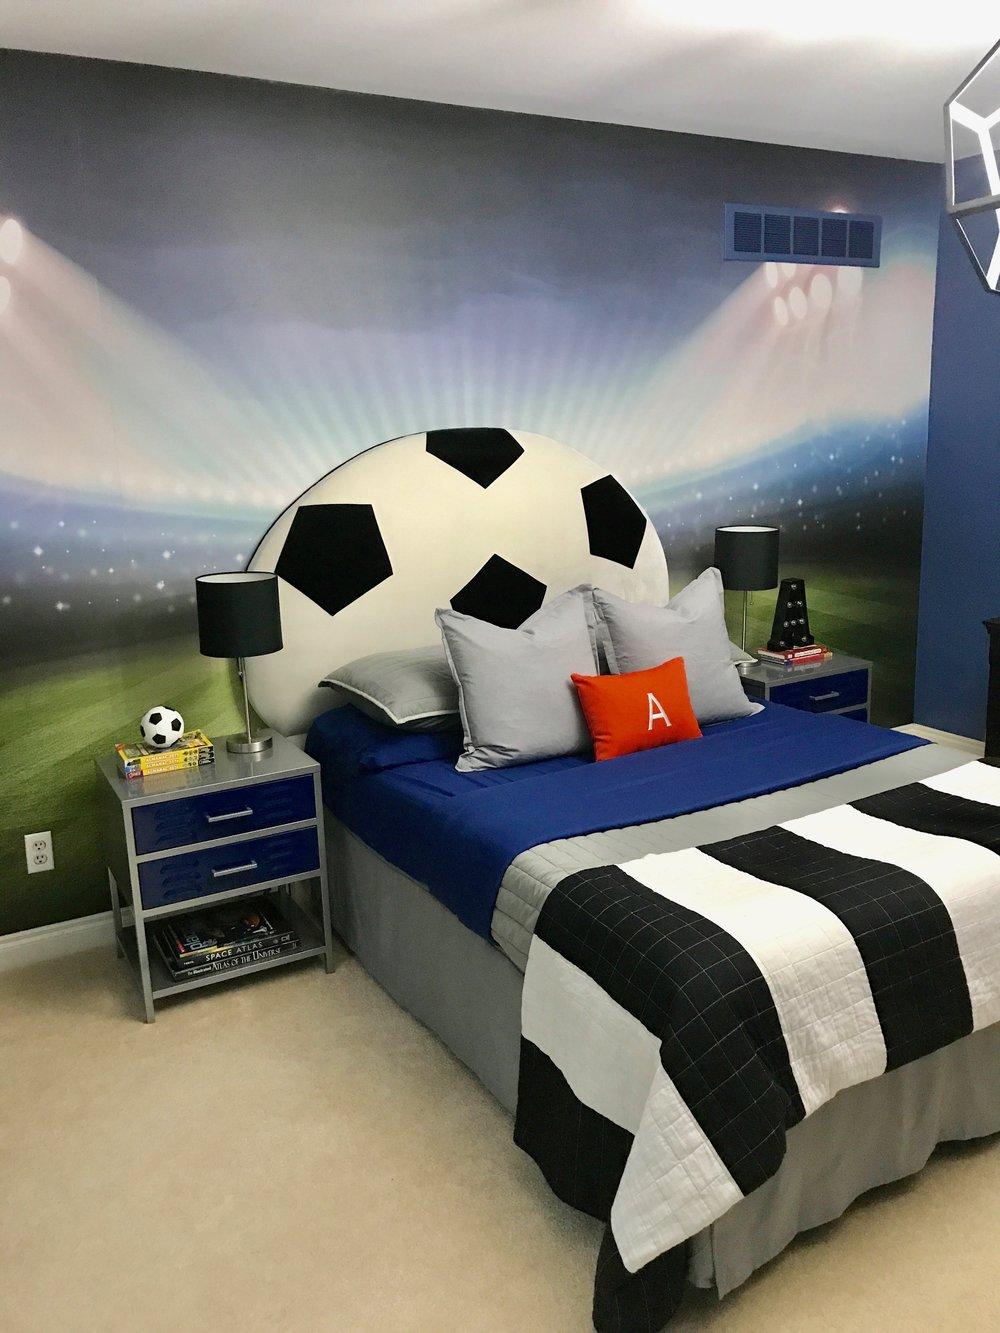 Decor for Kids, Dania Farhat, Soccer Boys Bedroom